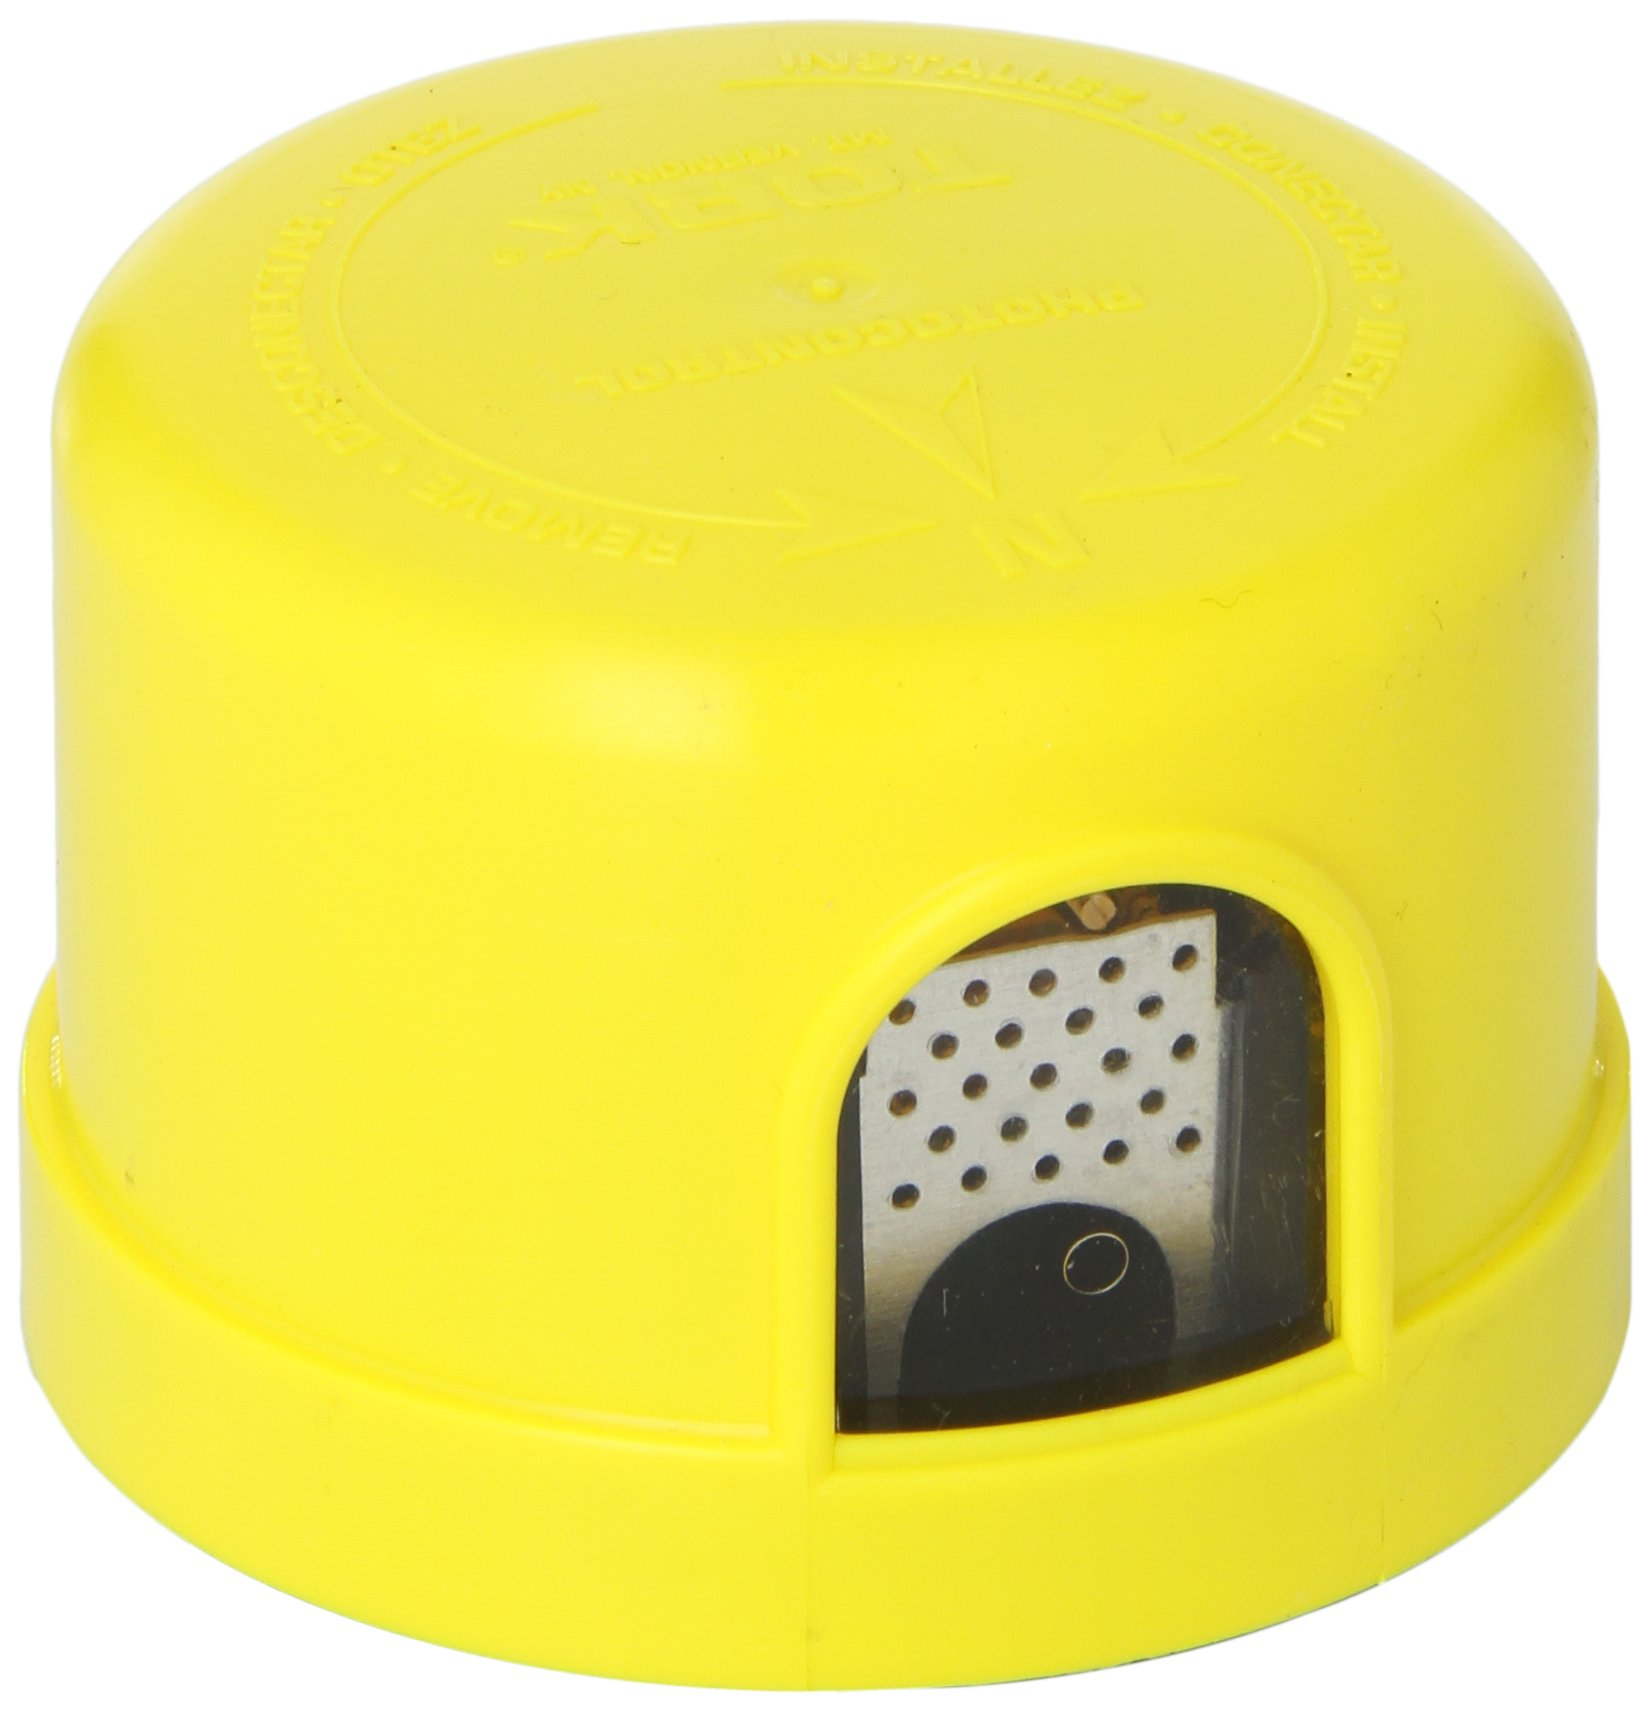 Quick Response Turn-Lock Mounting Photocontrol, 1800VA Ballast, 1000W Power, 400-550VAC Voltage, Yellow